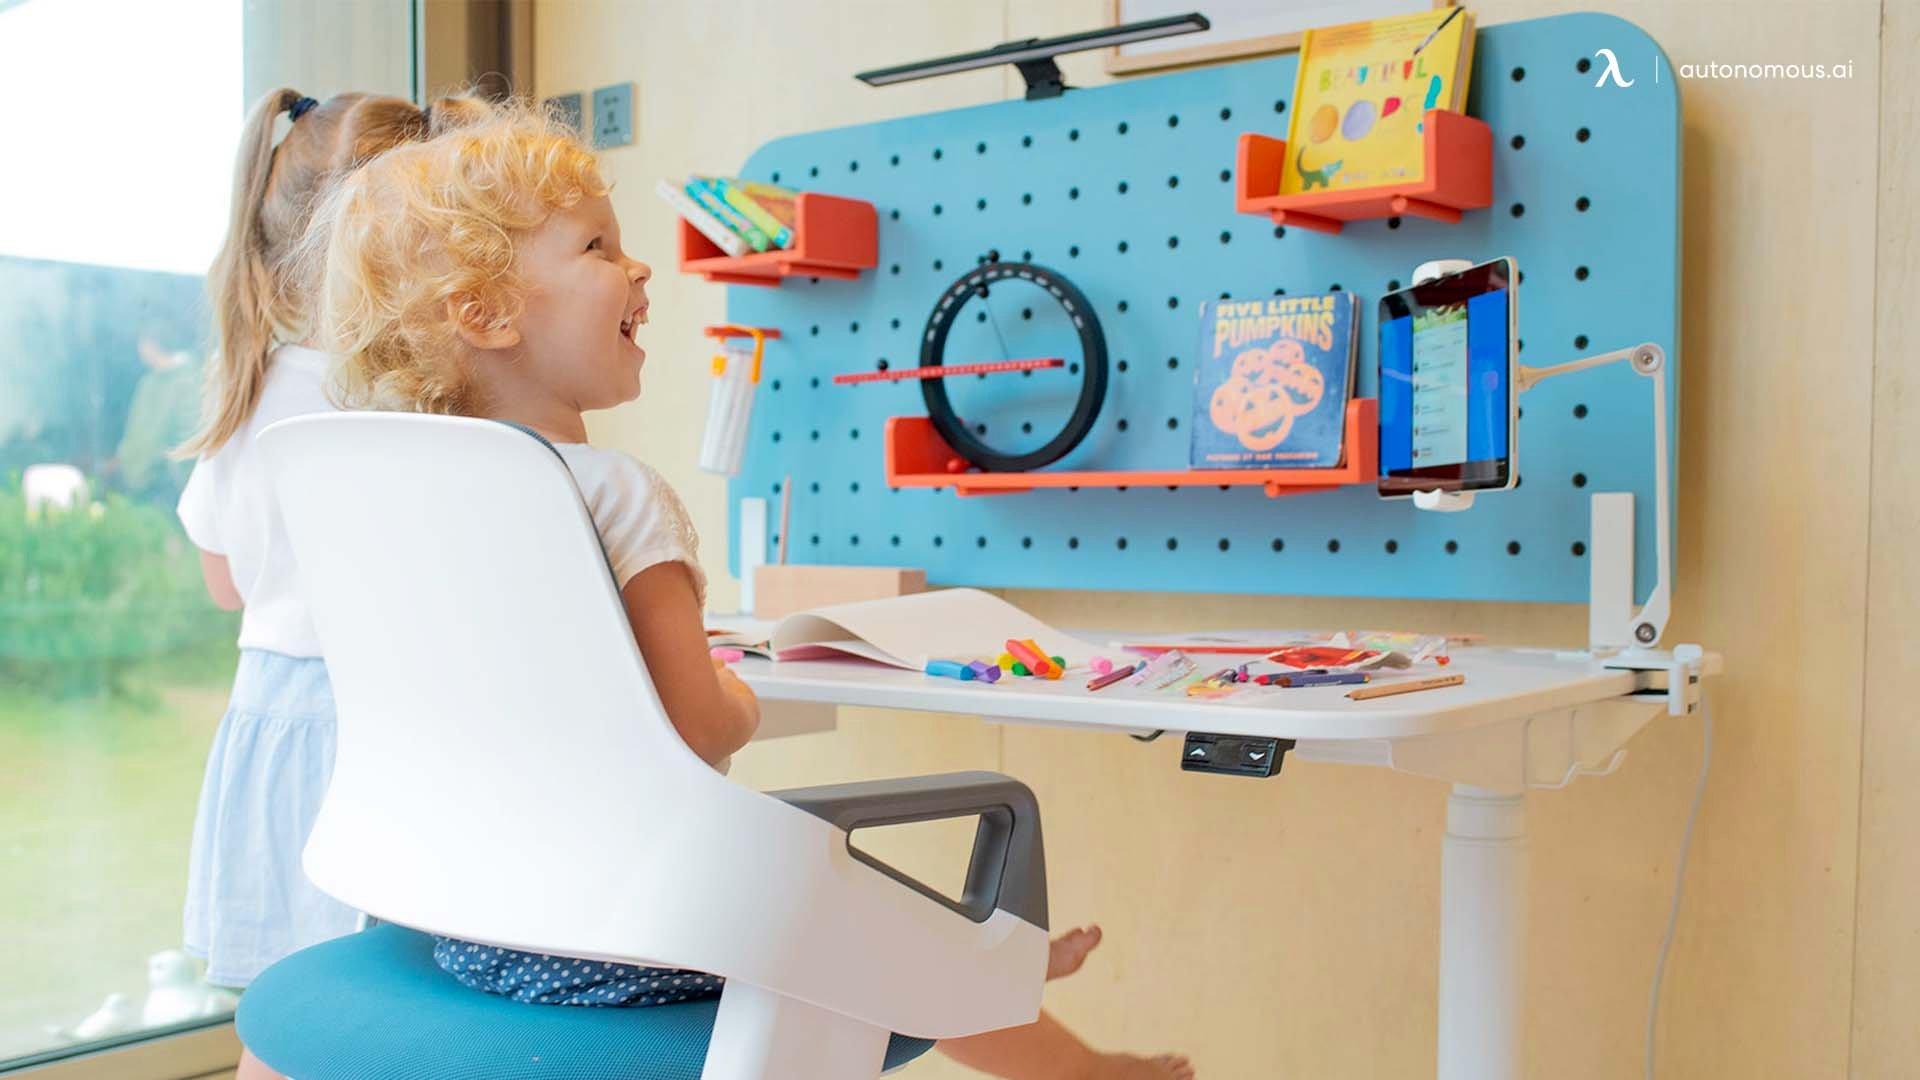 Should I Purchase a Height-Adjustable Desk?